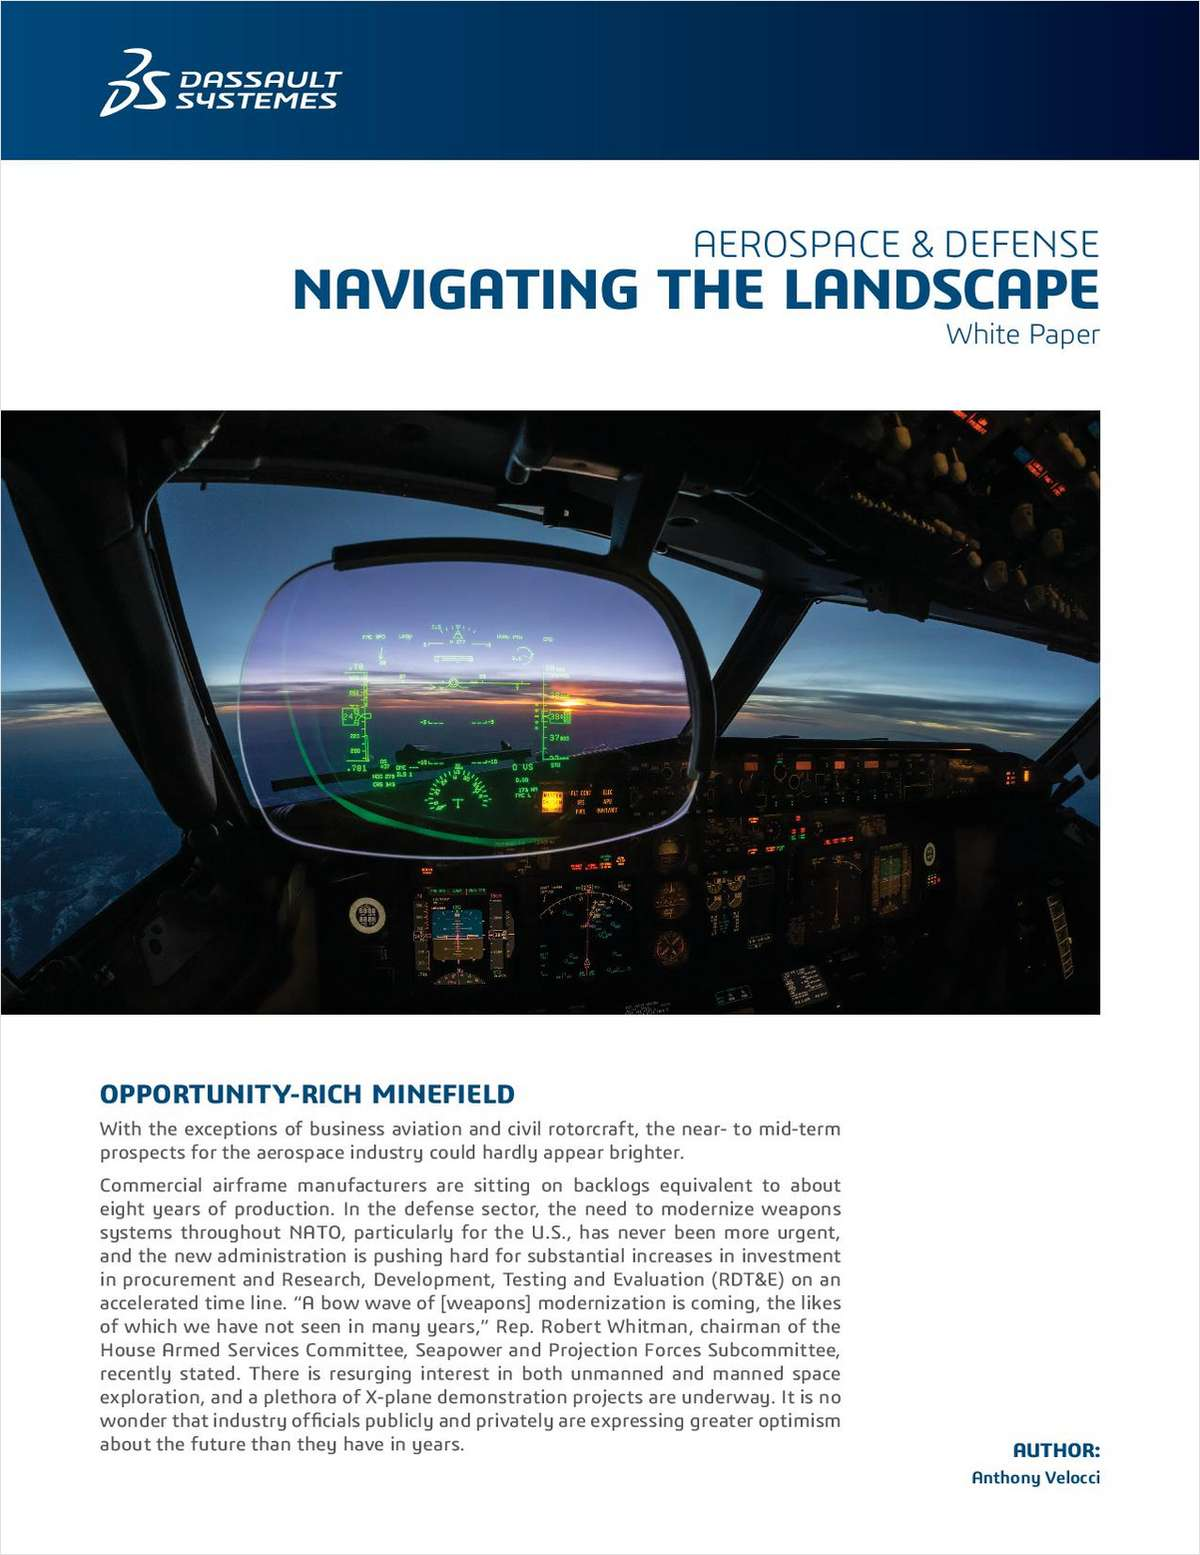 Aerospace & Defense - Navigating the Landscape